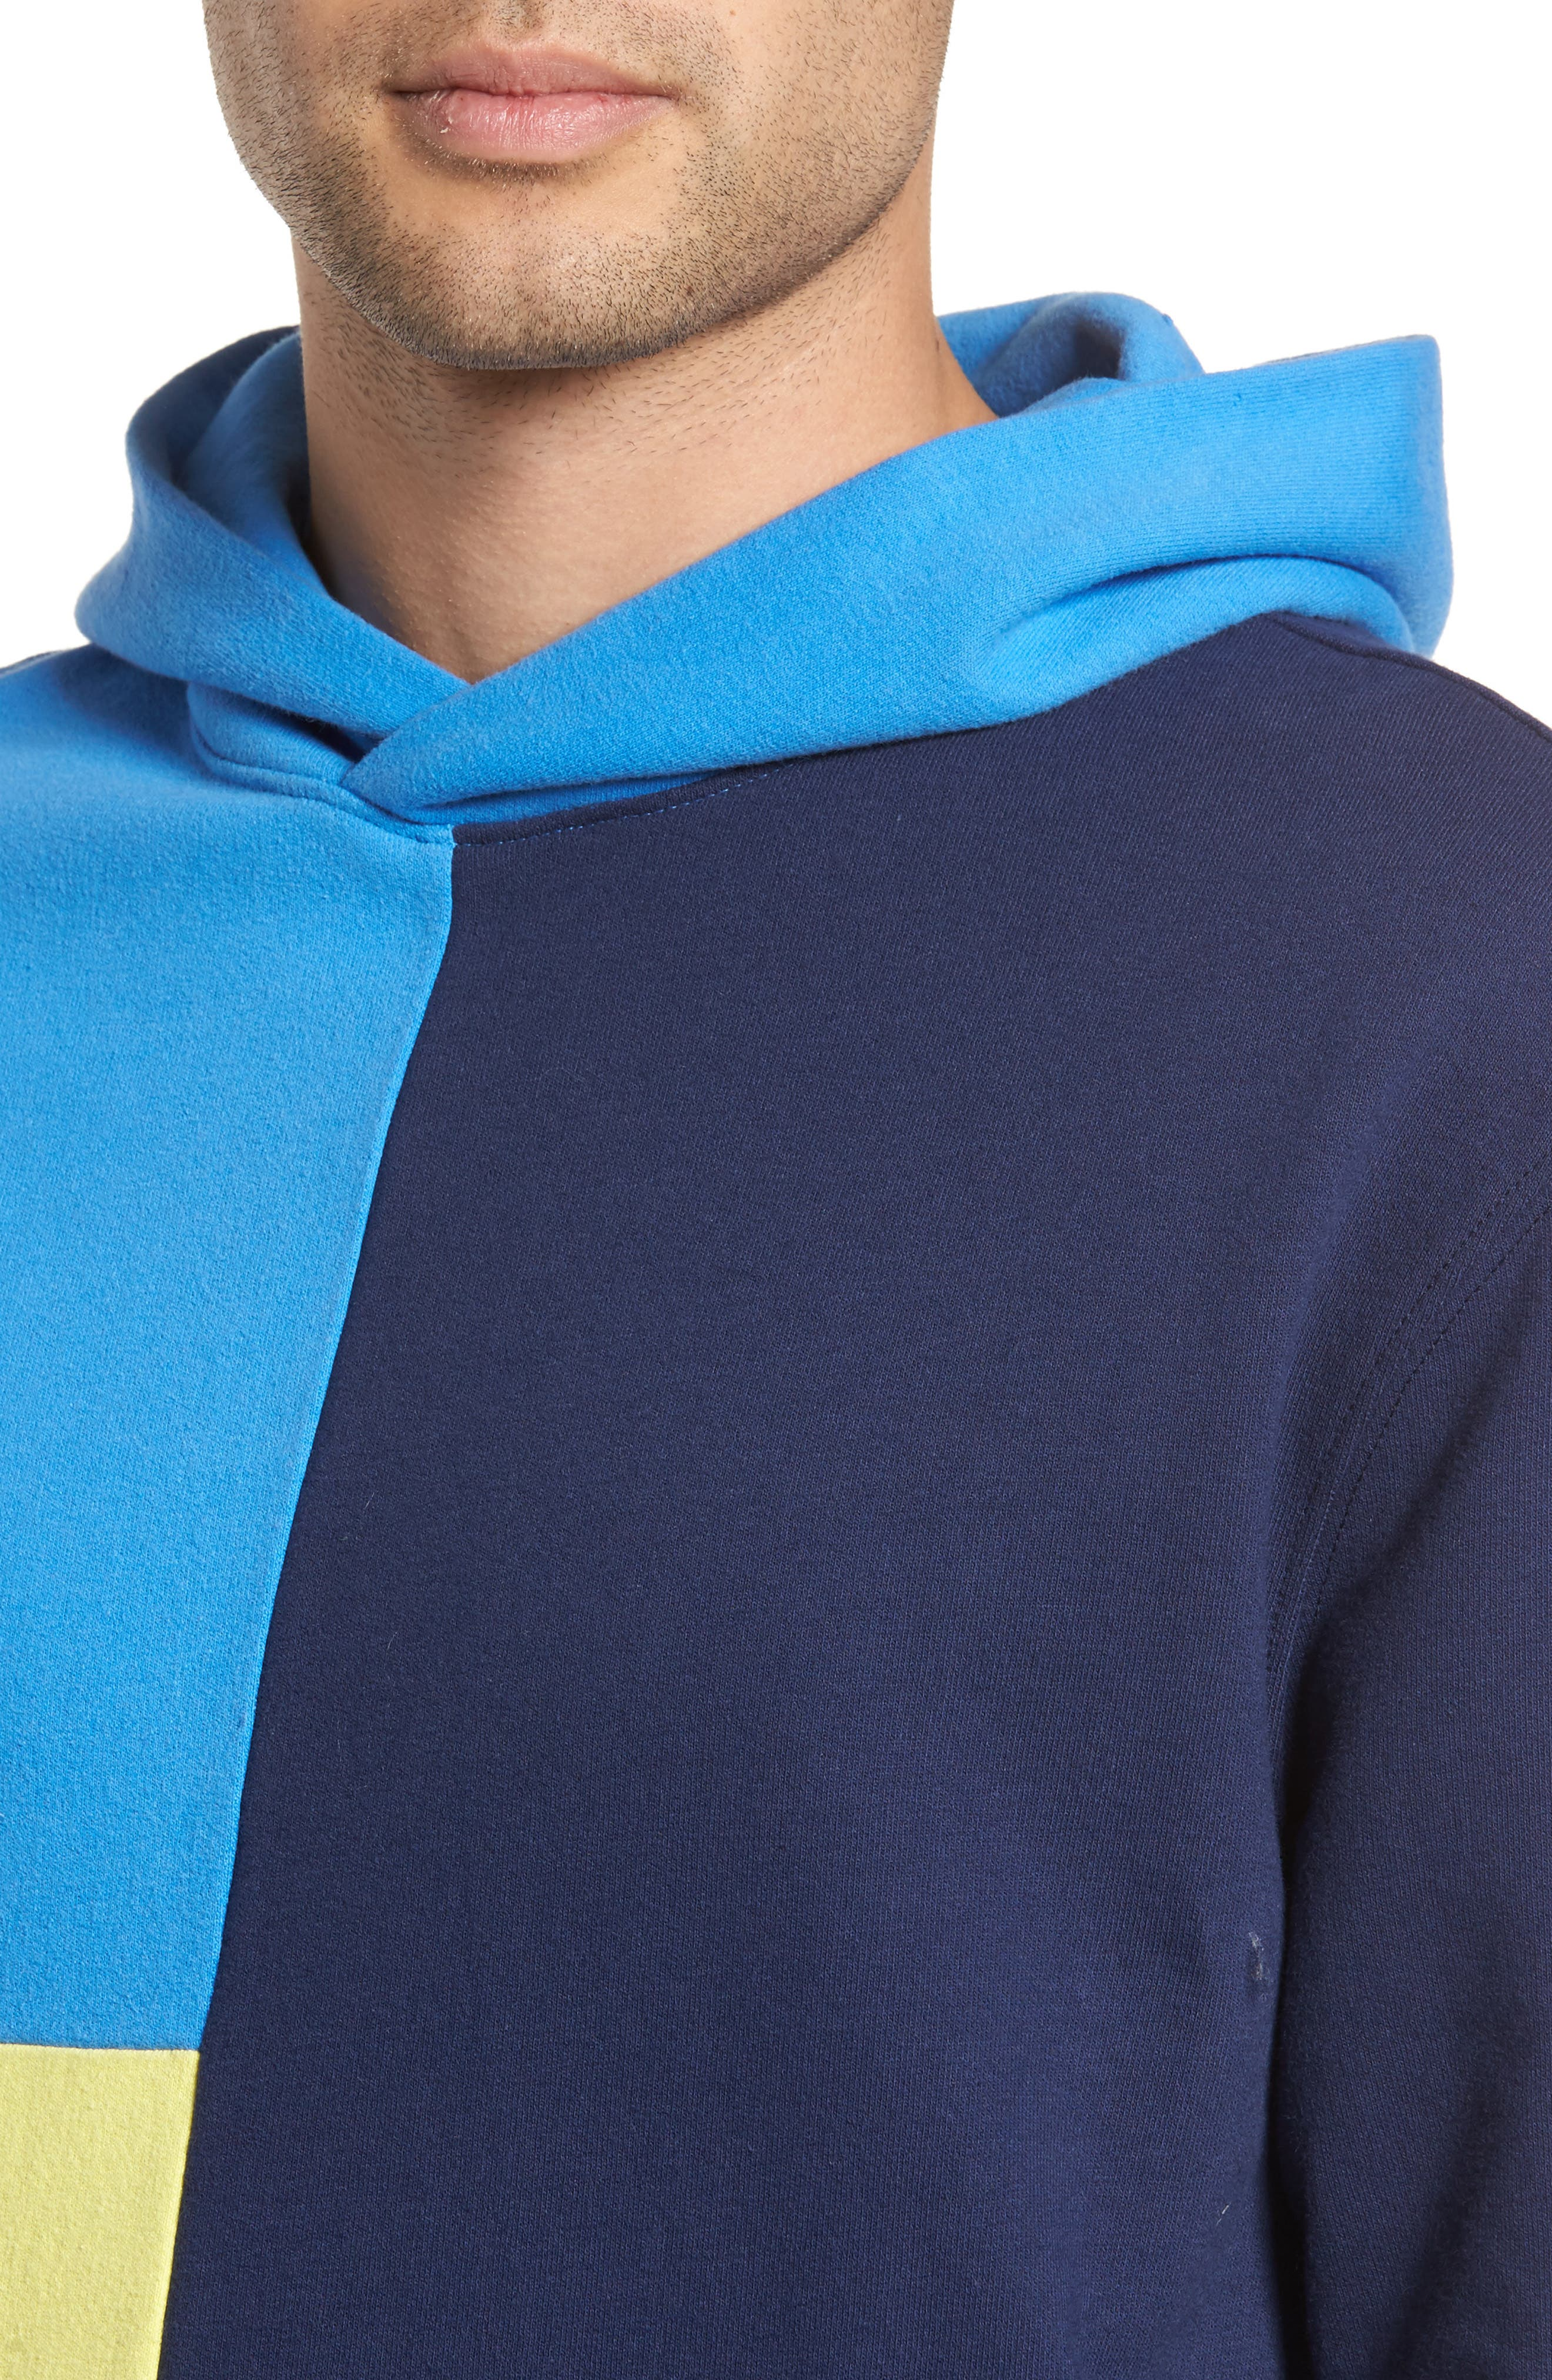 Colorblock Hoodie Sweatshirt,                             Alternate thumbnail 4, color,                             Navy Blue Yellow Block